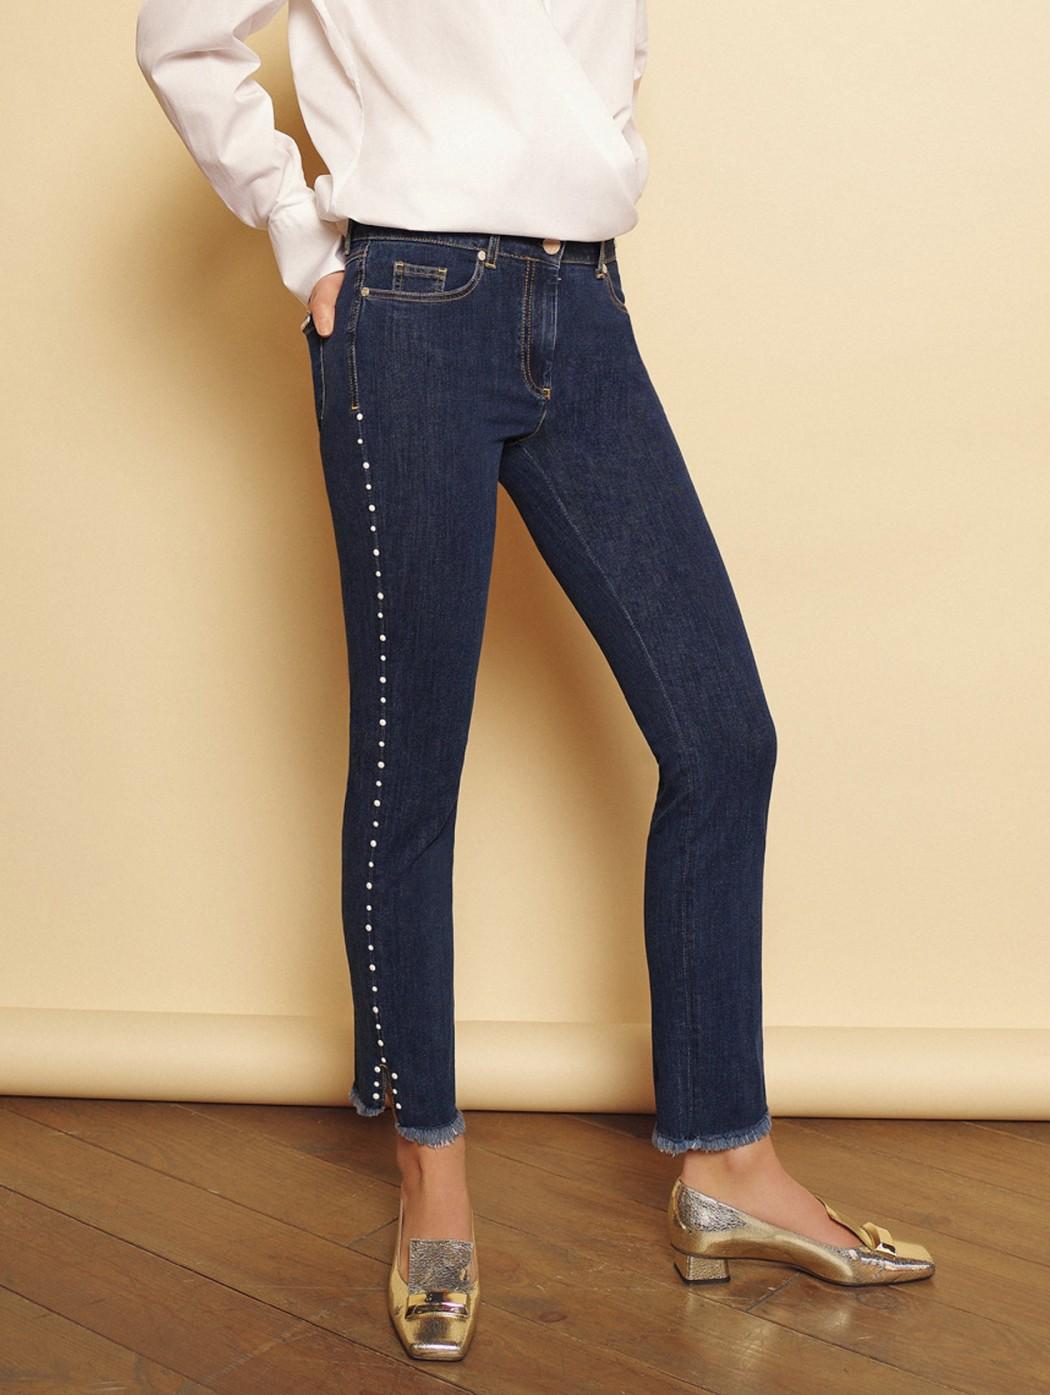 Pantalone corto jeans denim...